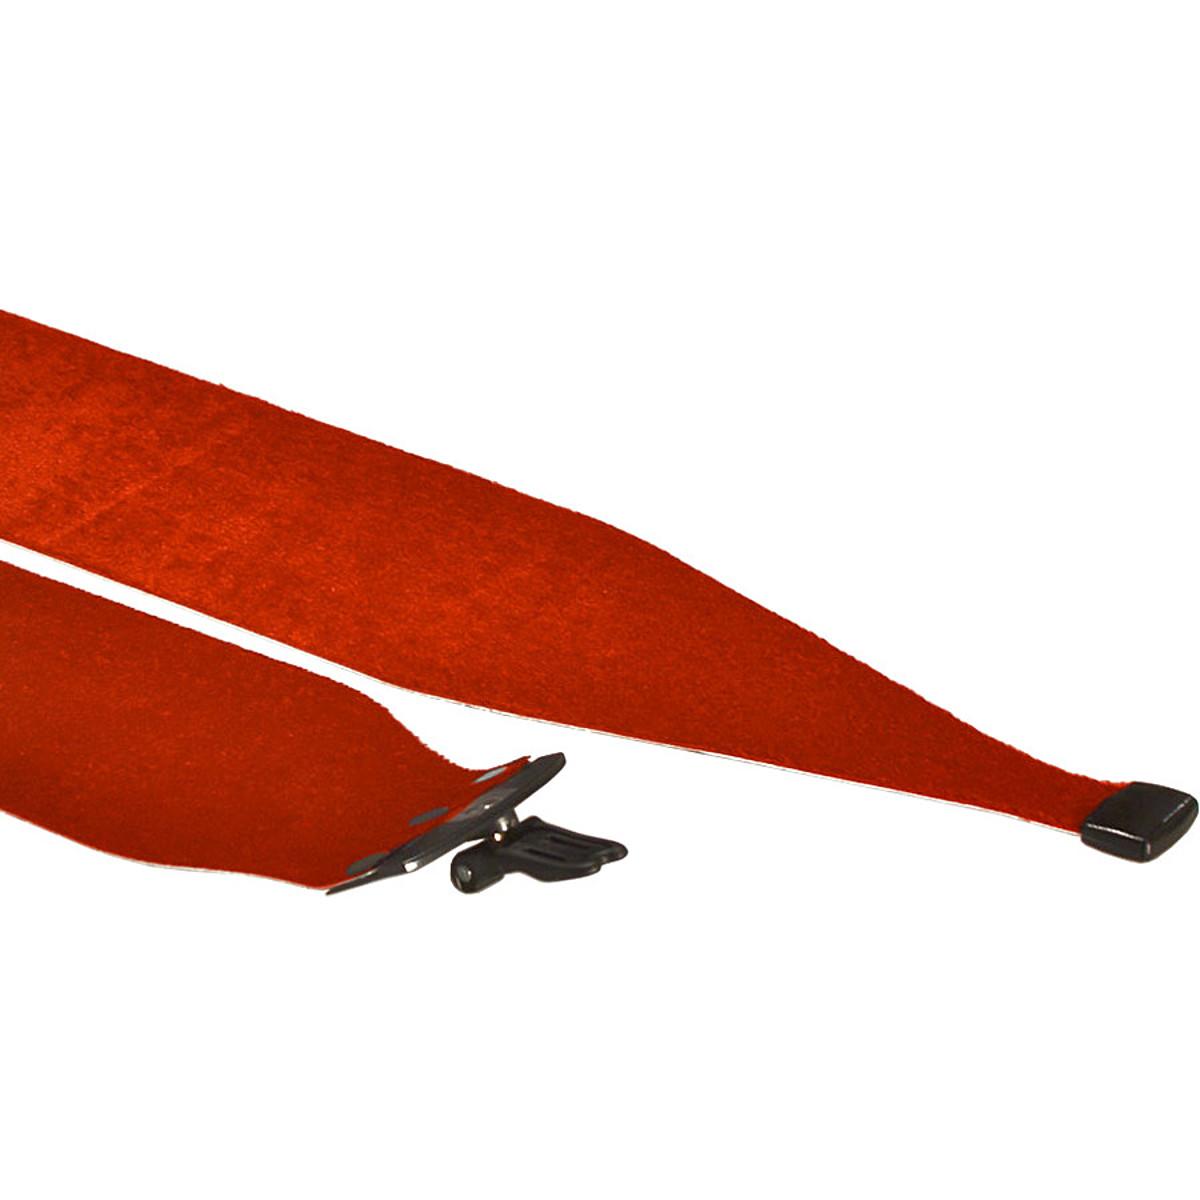 Ski Trab Polvere Skins